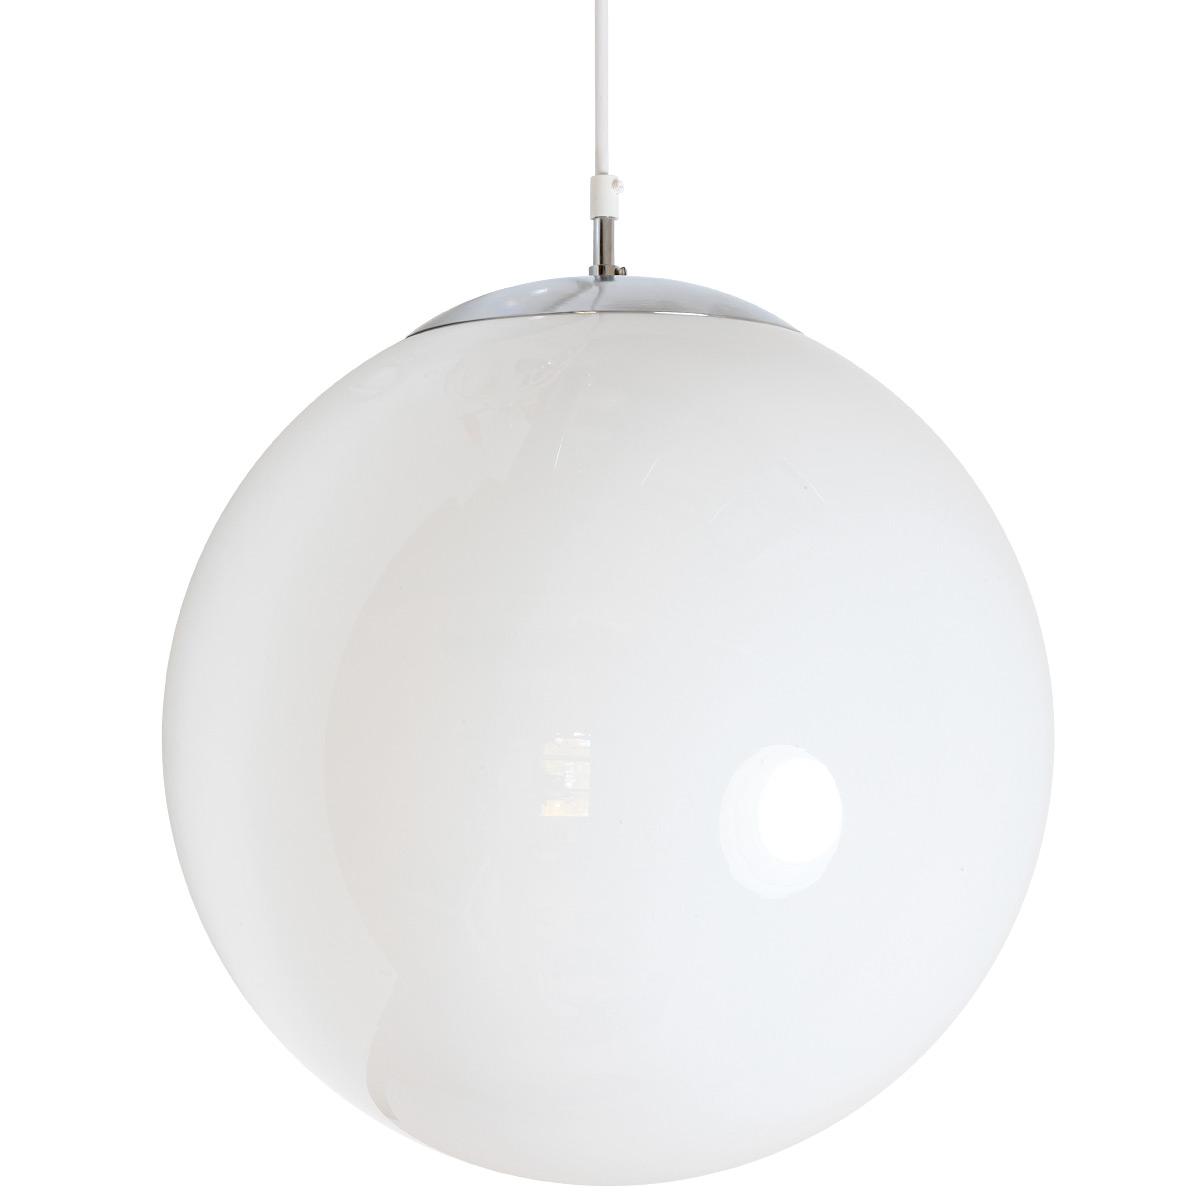 Minimalistische Kugel Lampe Munchen Casa Lumi